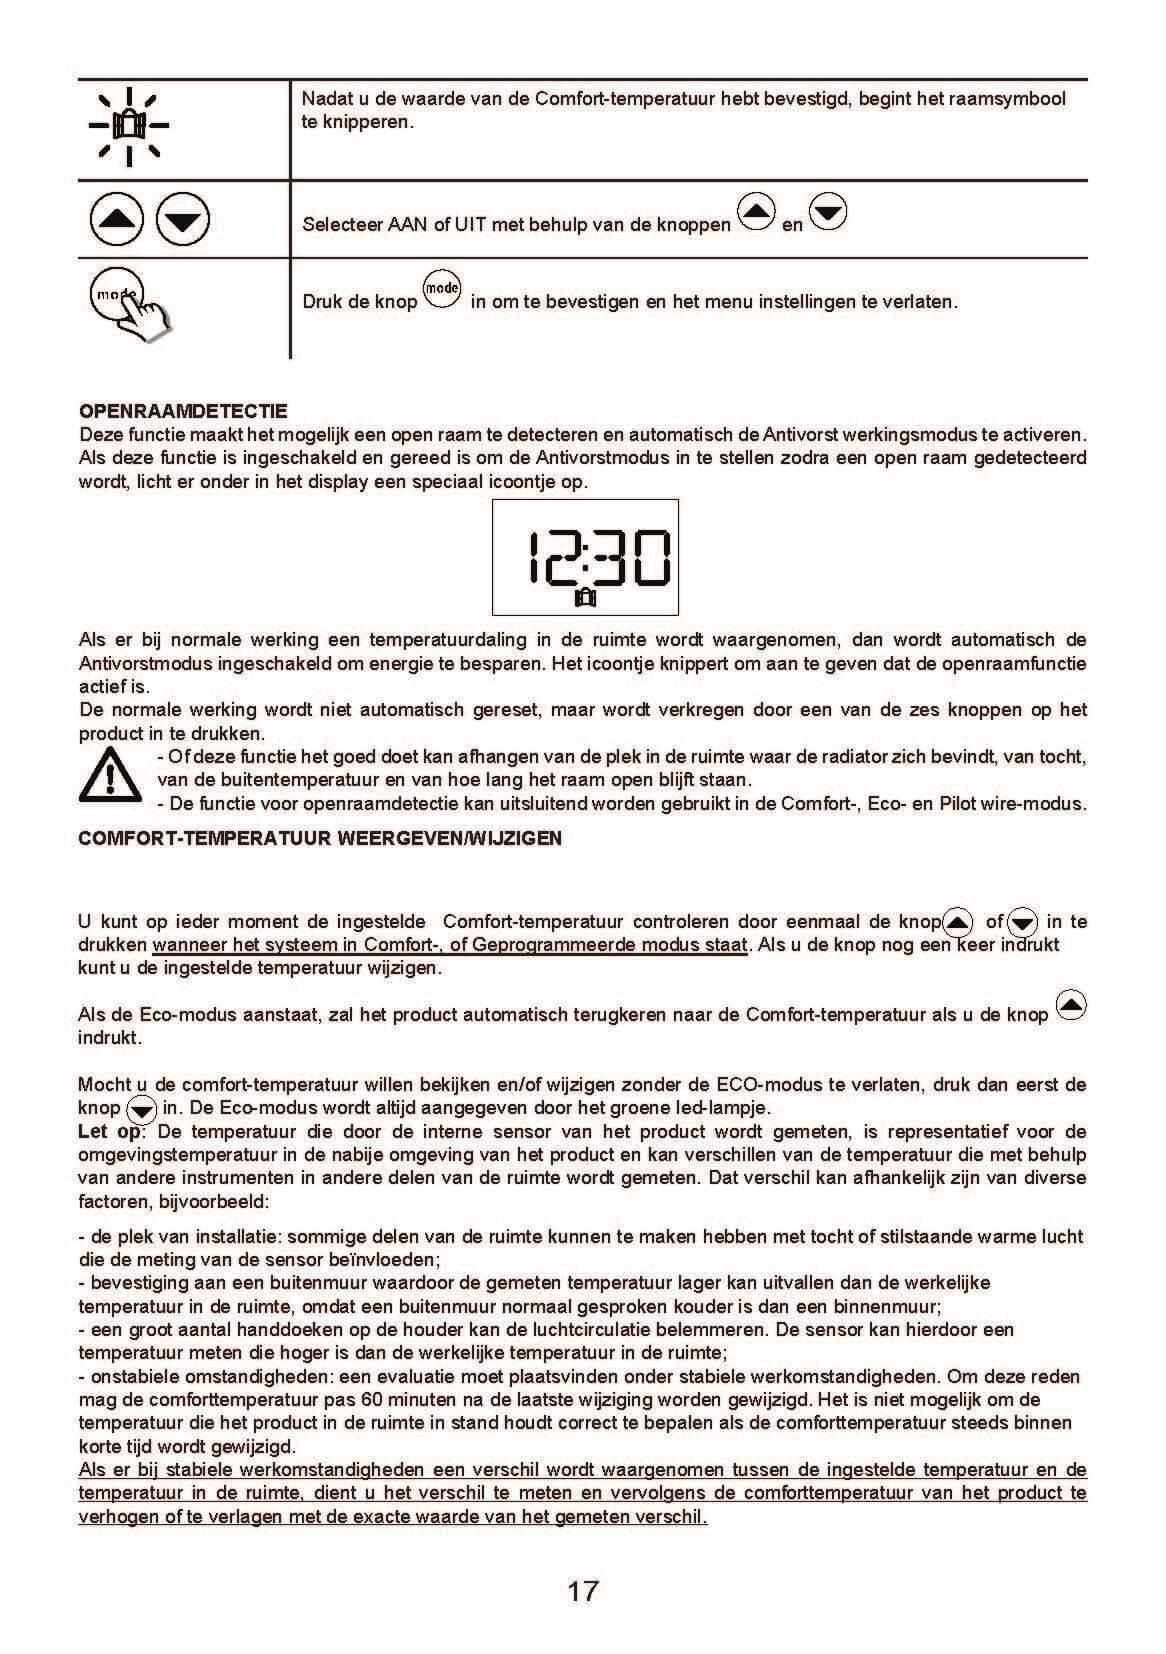 H-70.20_H-DRL-E_Comfort_Deva_Handleiding_NL_2018_Pagina_17